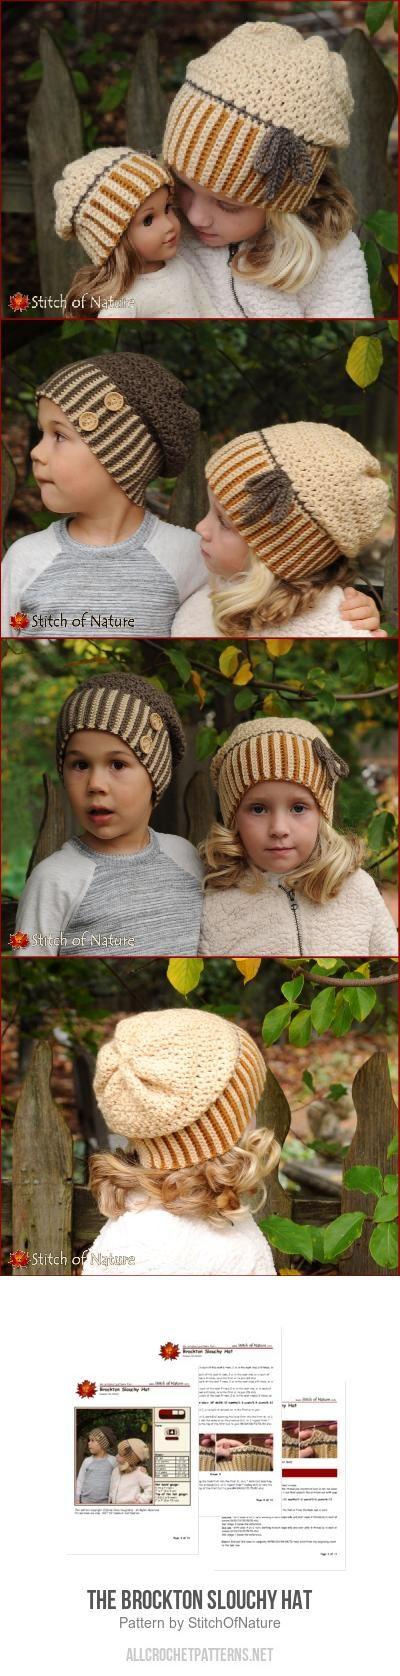 The Brockton Slouchy Hat crochet pattern